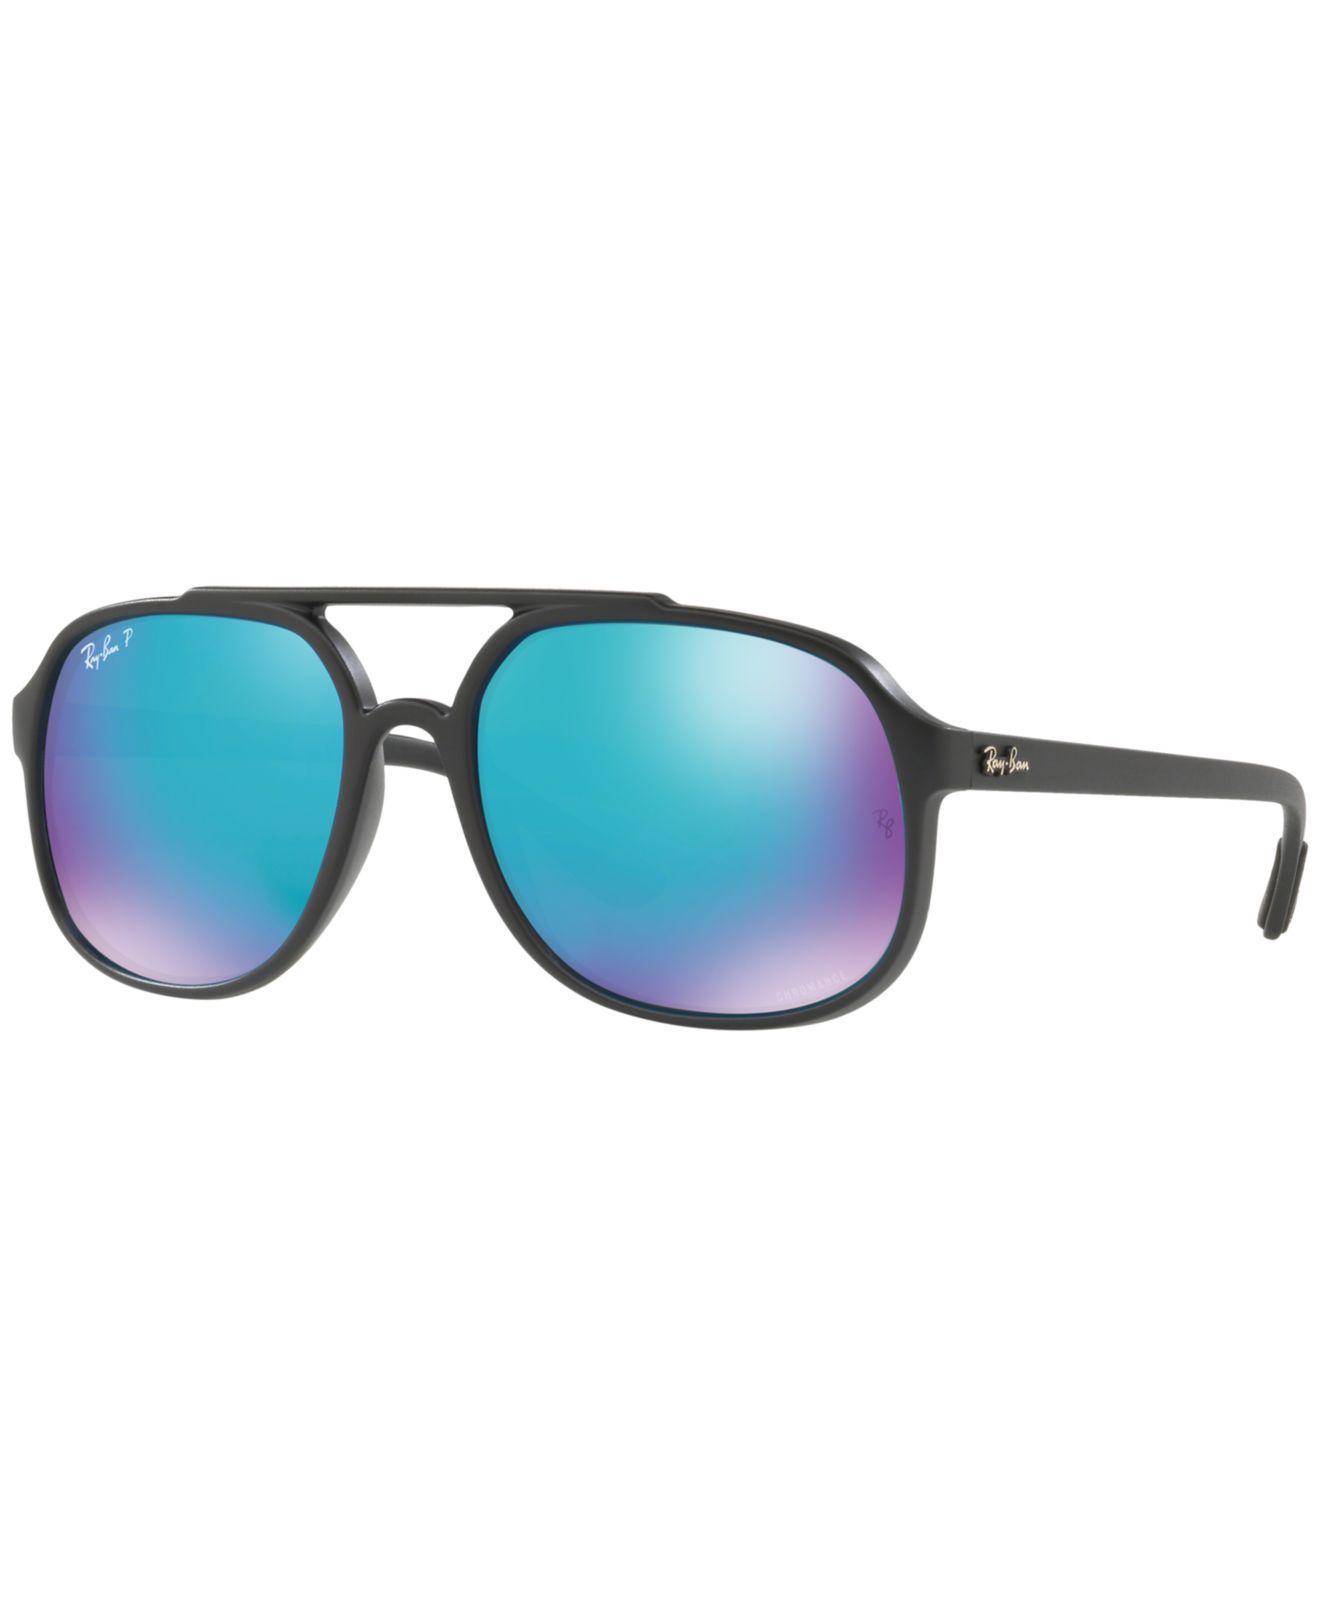 5cc8c3a6977 Ray-Ban. Women s Blue Polarized Sunglasses